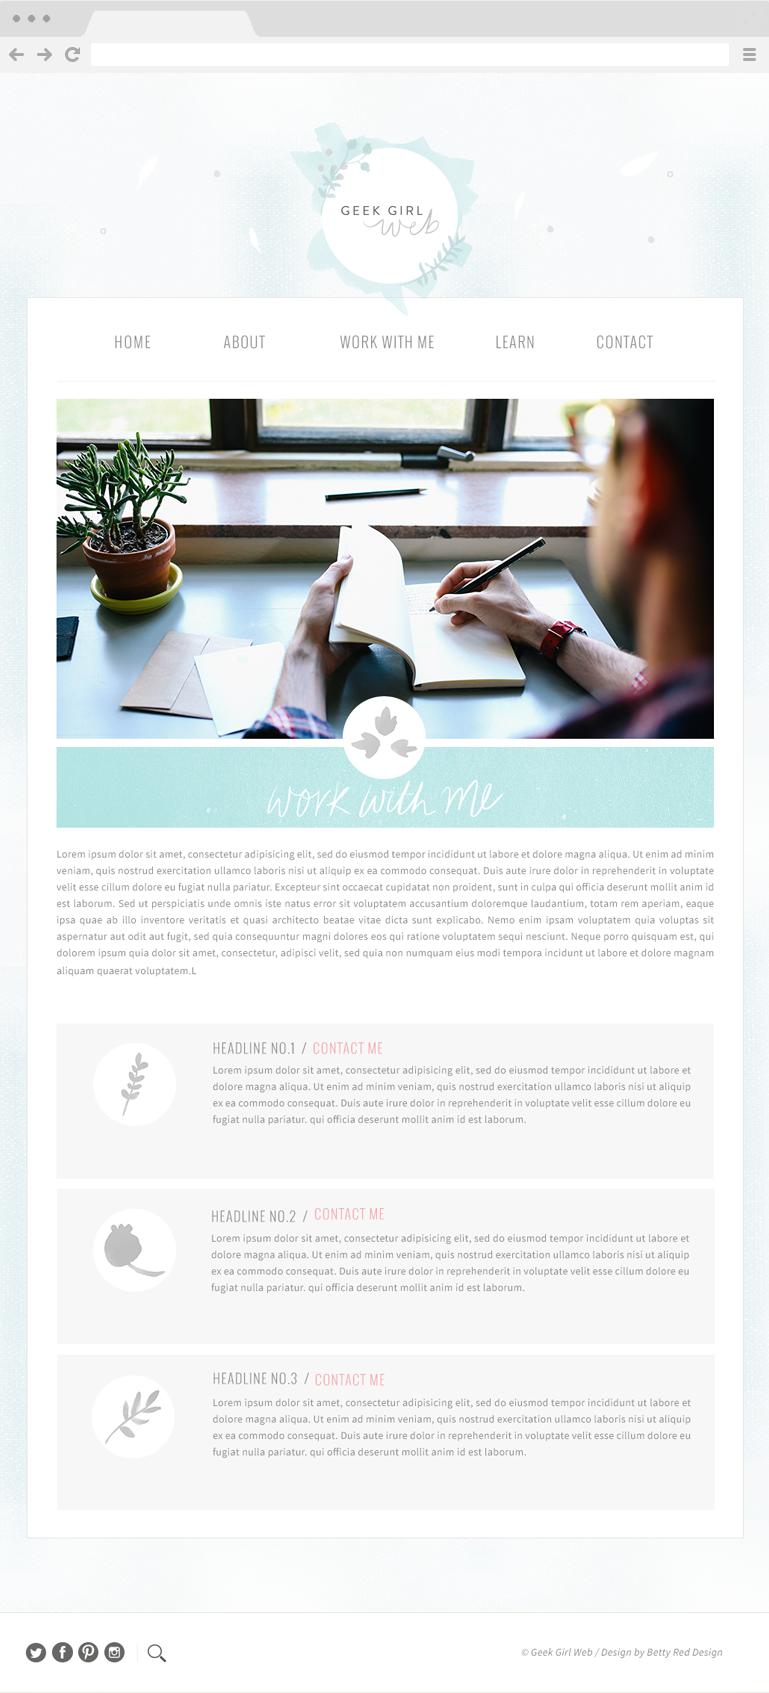 geek-girl-website-2.png